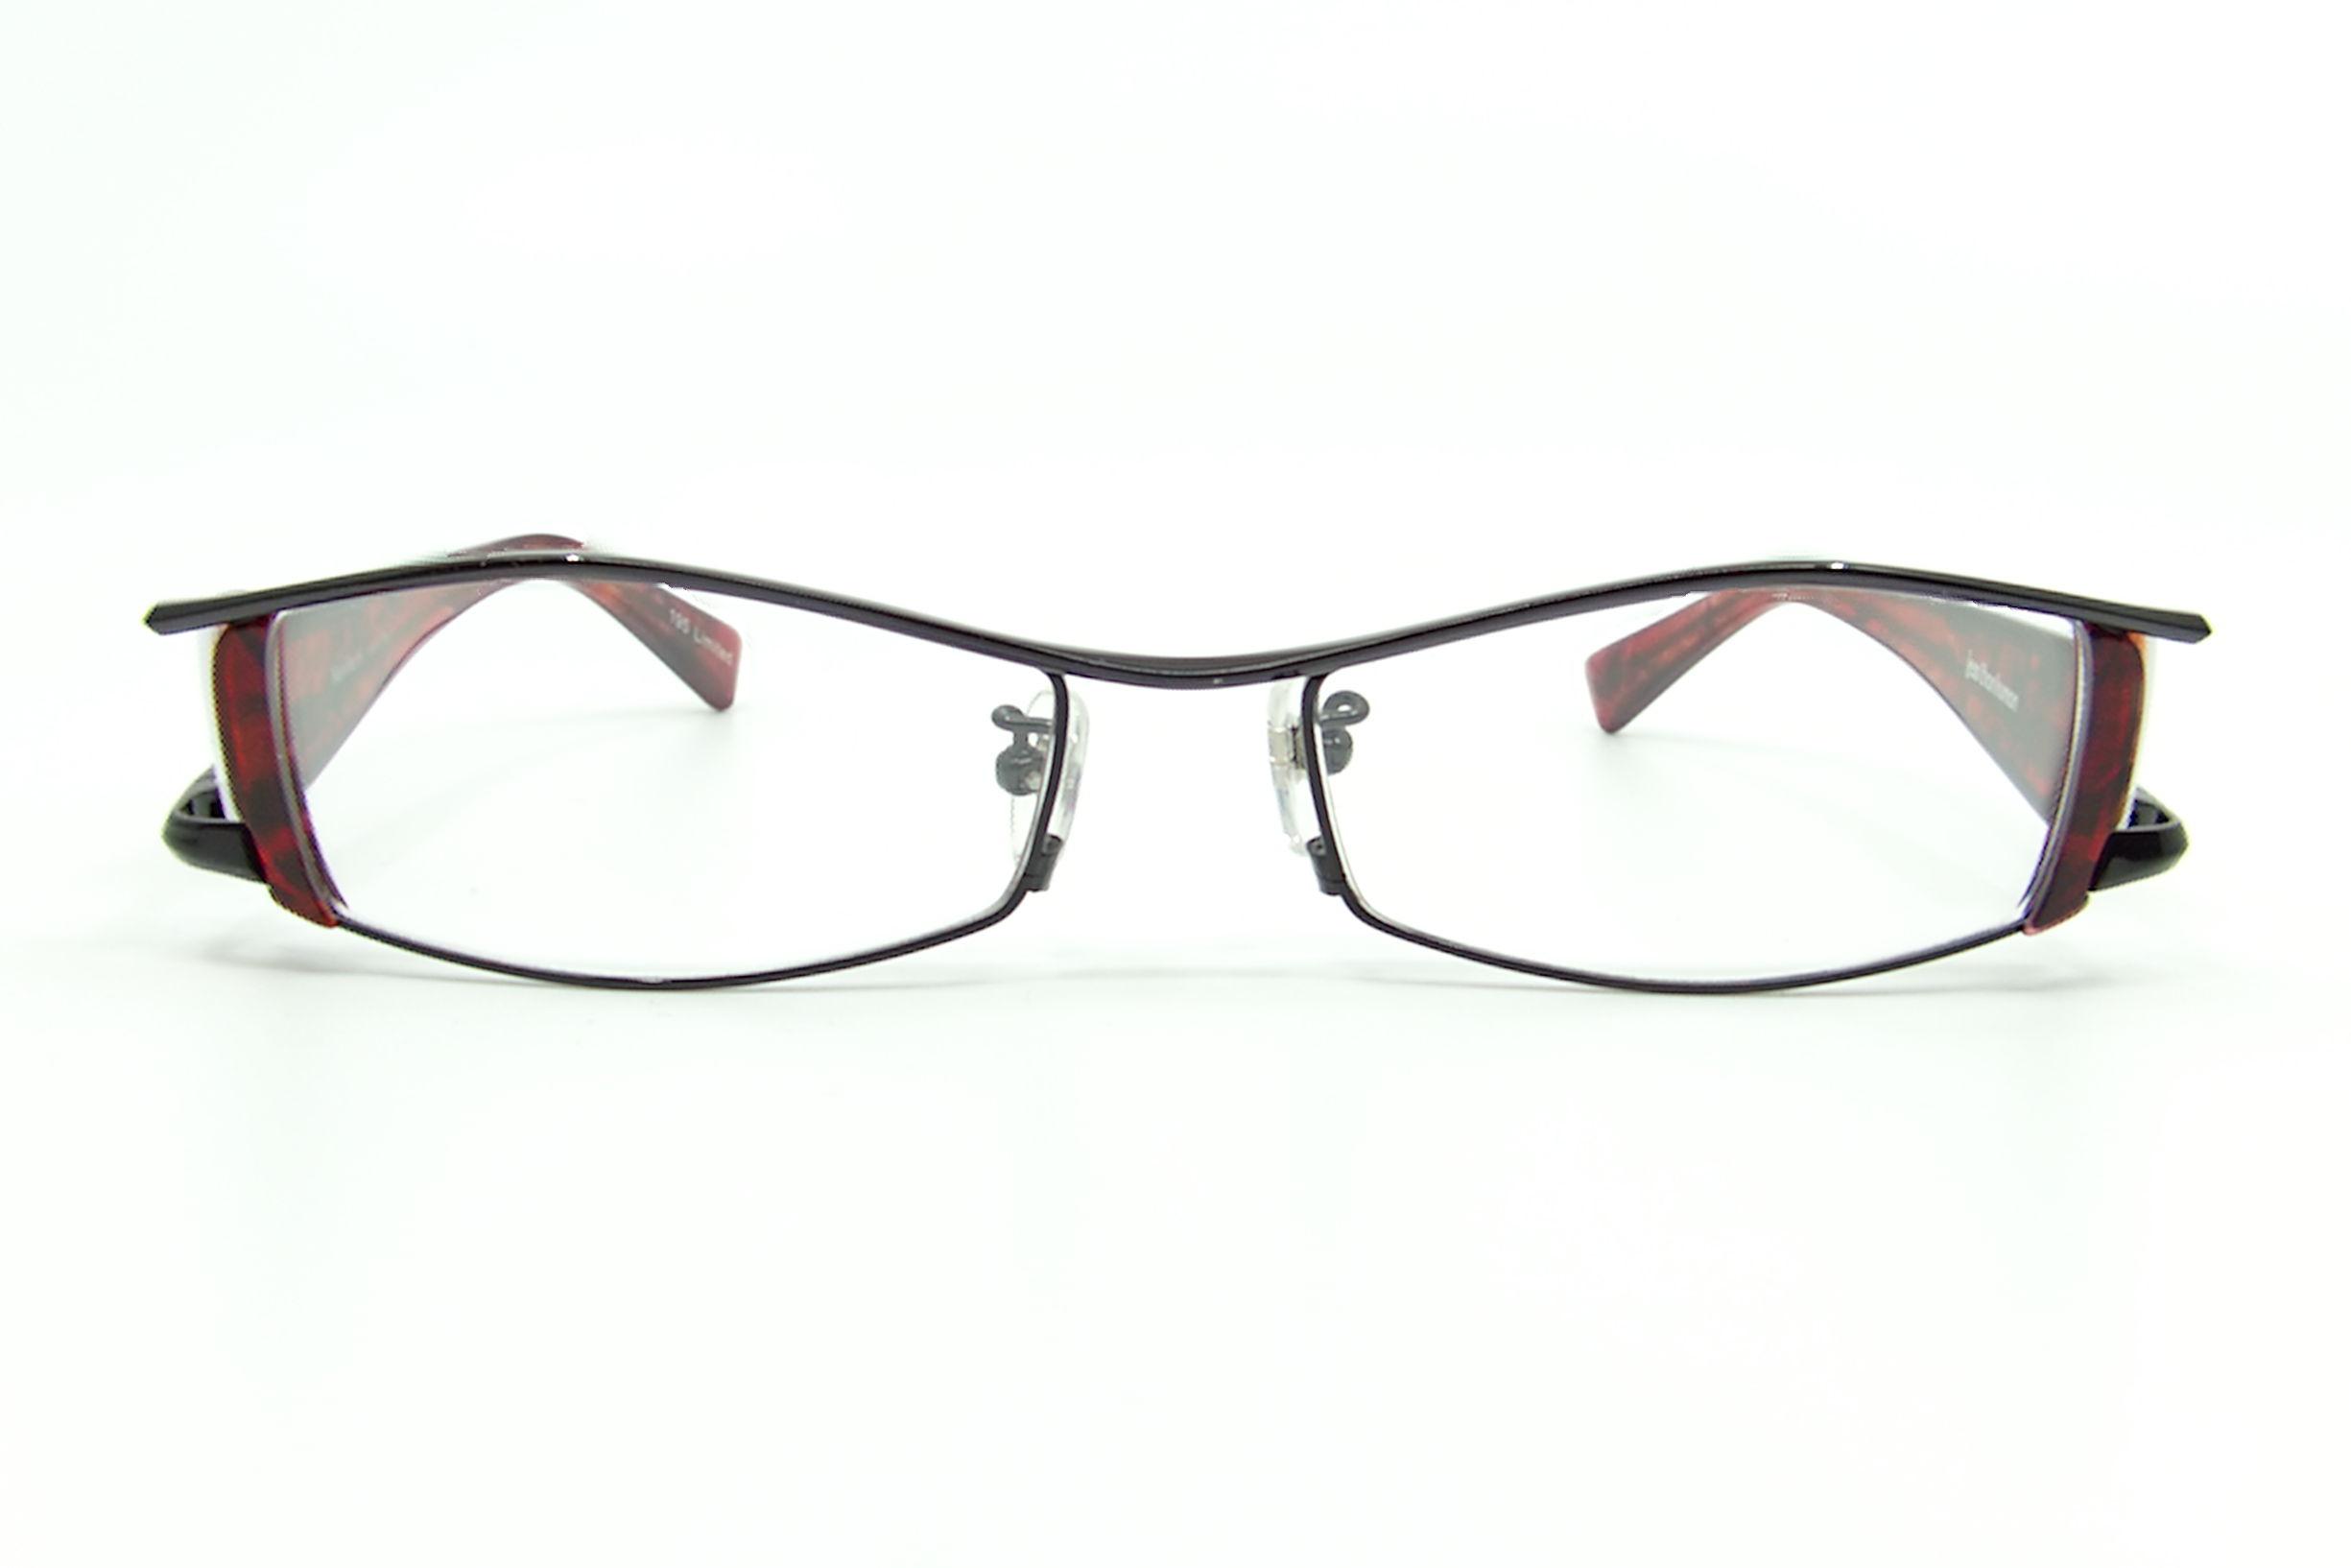 Neville.H 195 limited